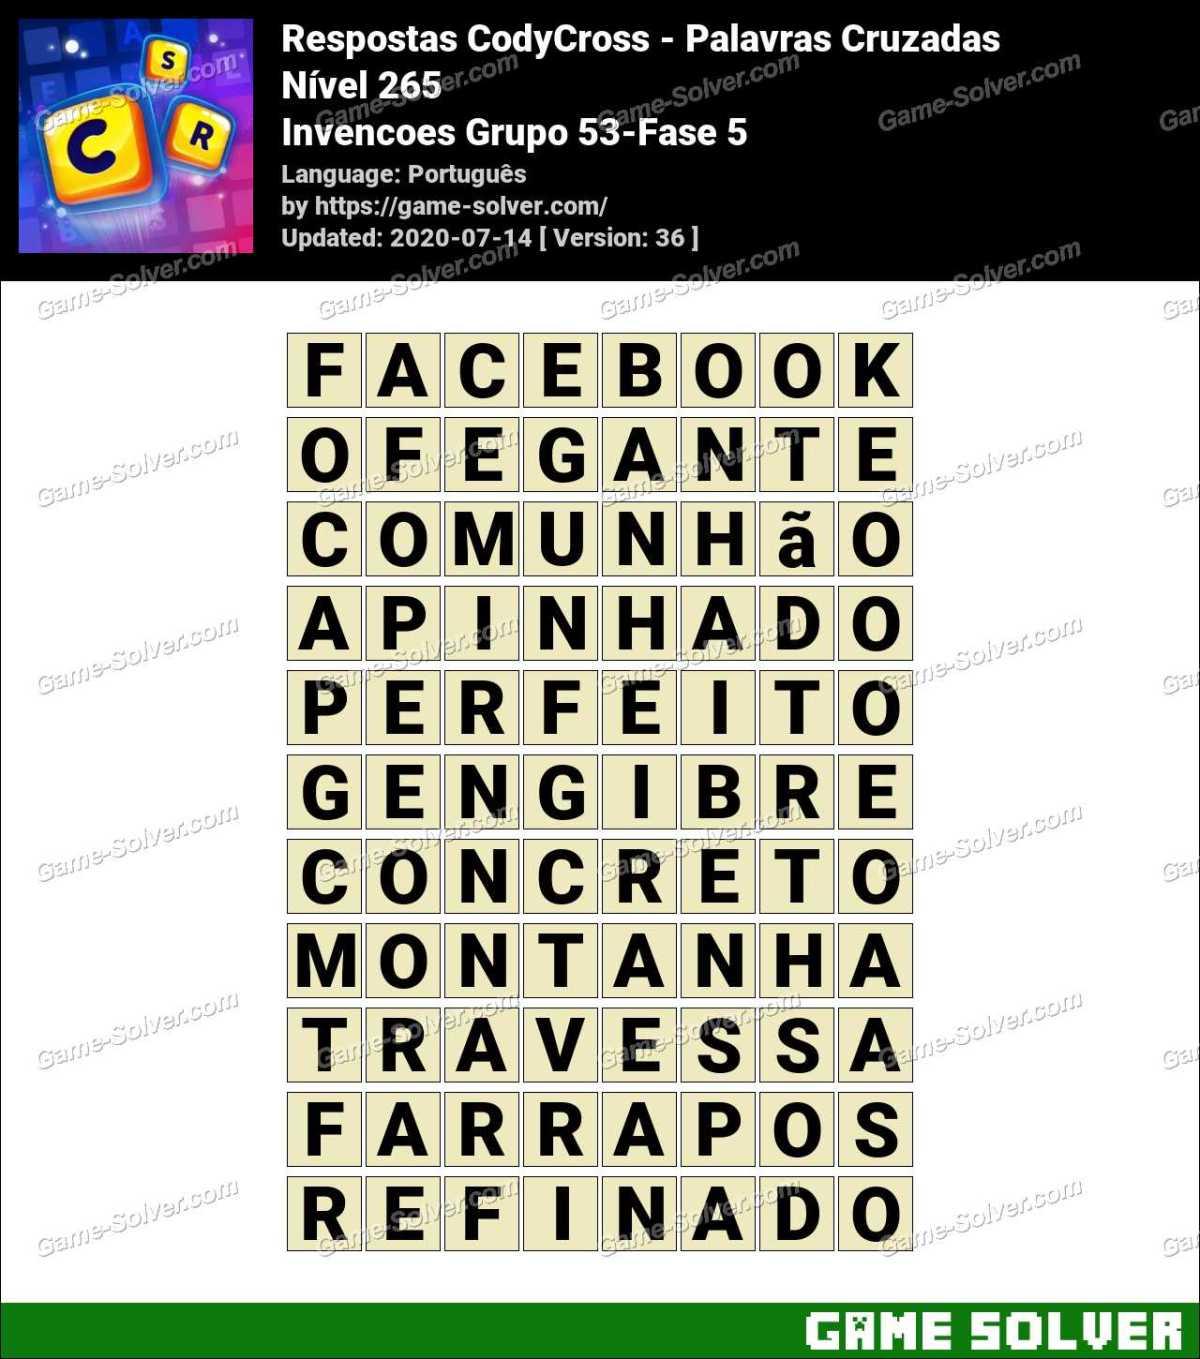 Respostas CodyCross Invencoes Grupo 53-Fase 5